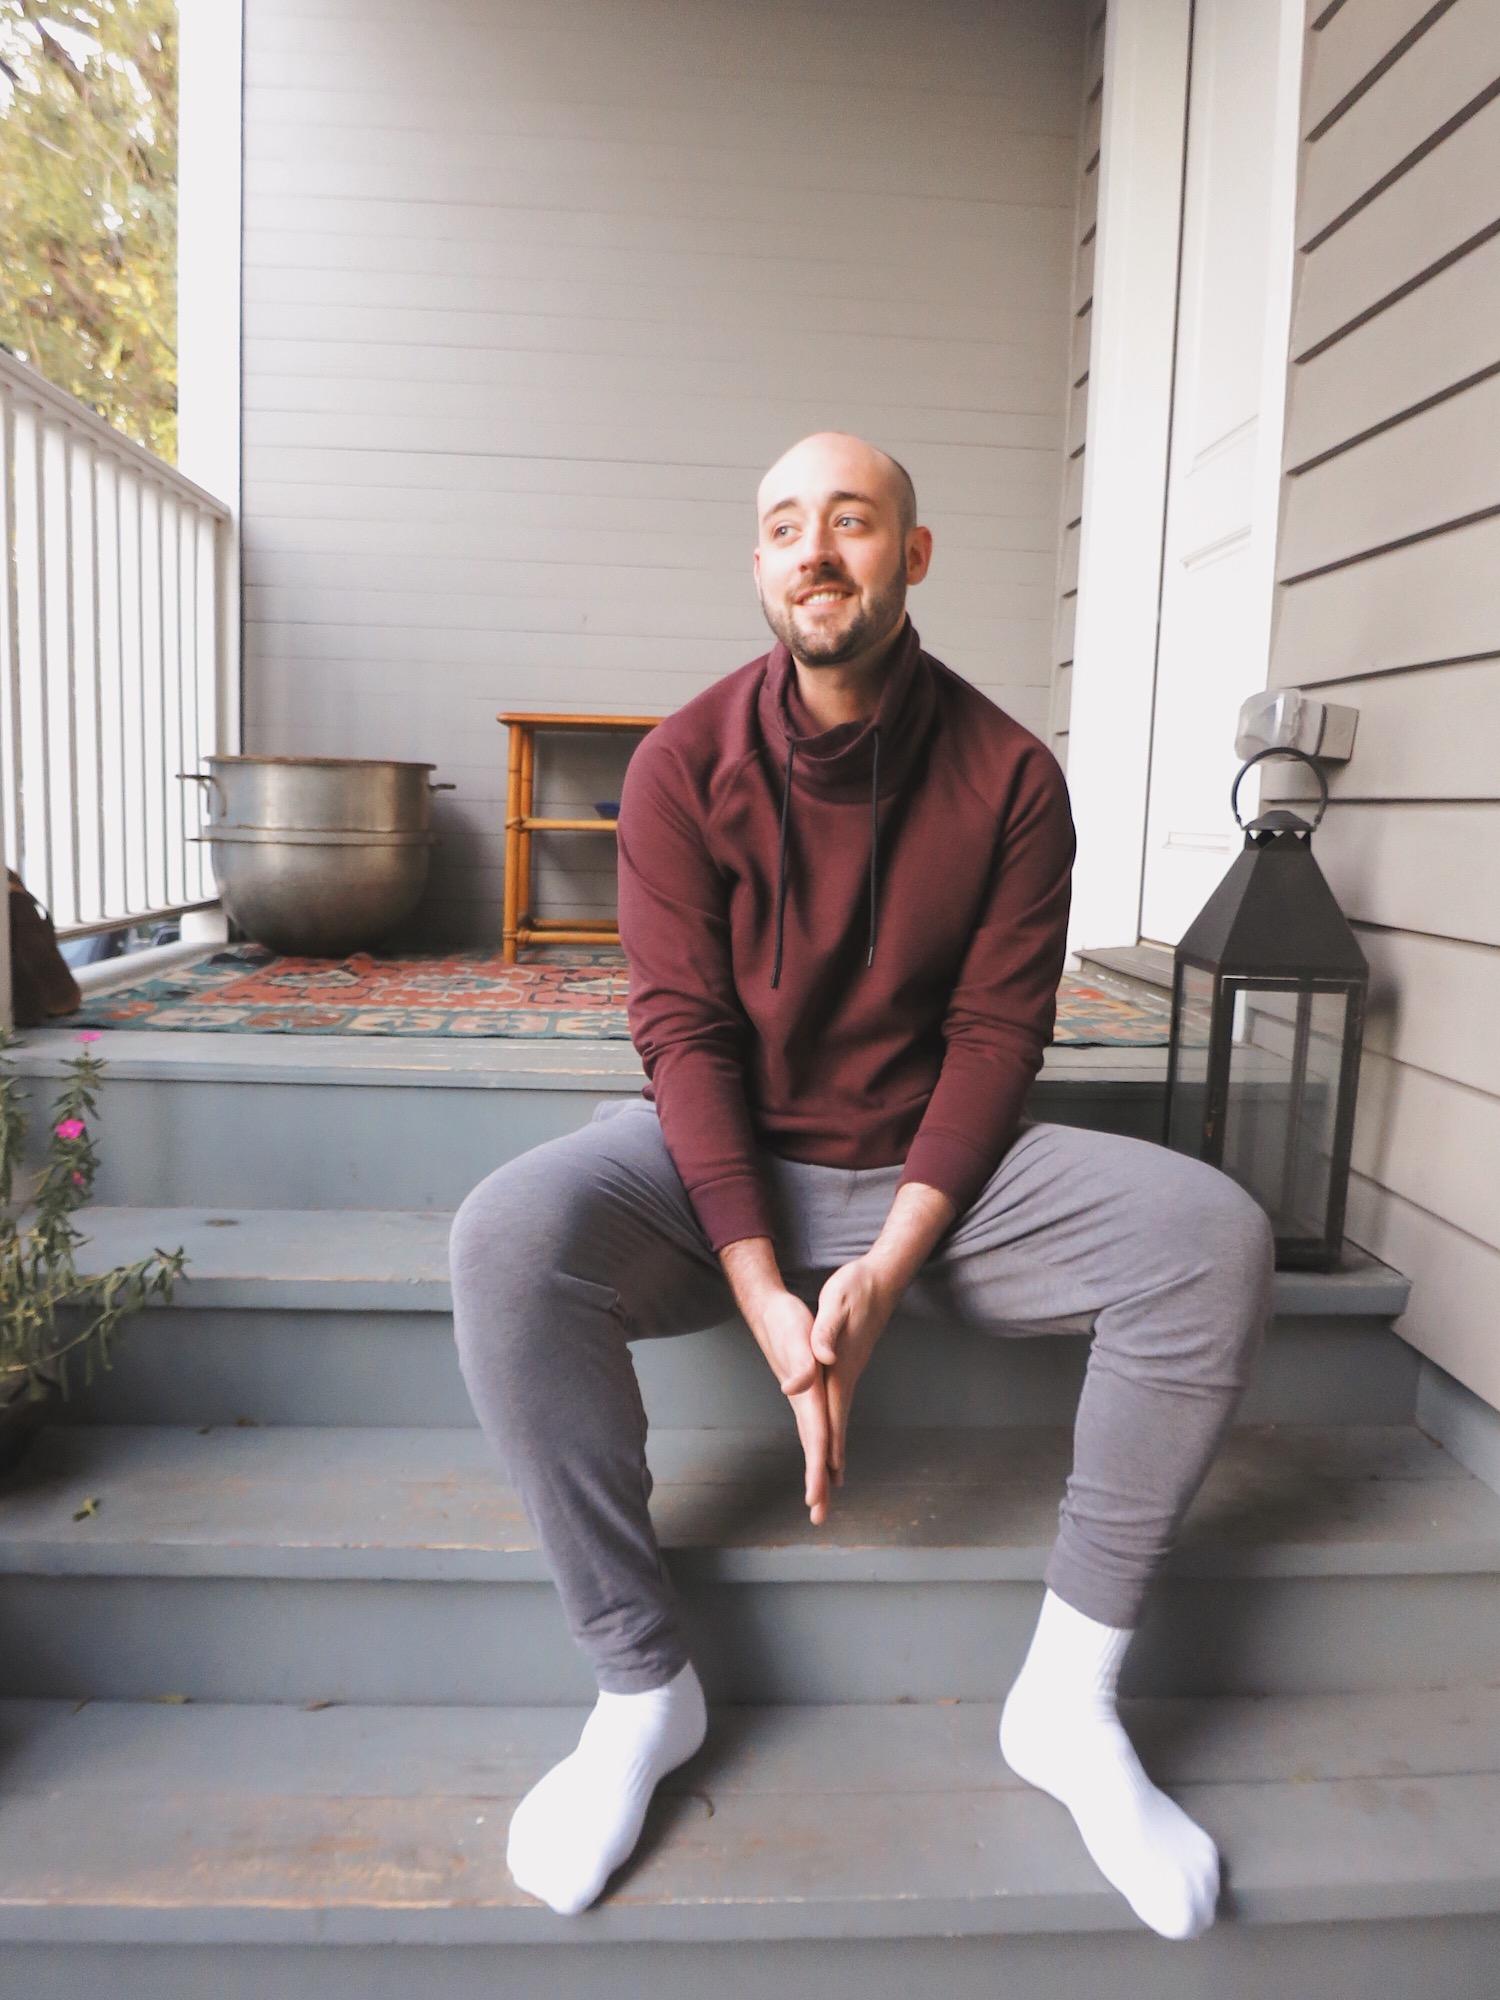 Fall Fashion 2018 - Comfy Clothes